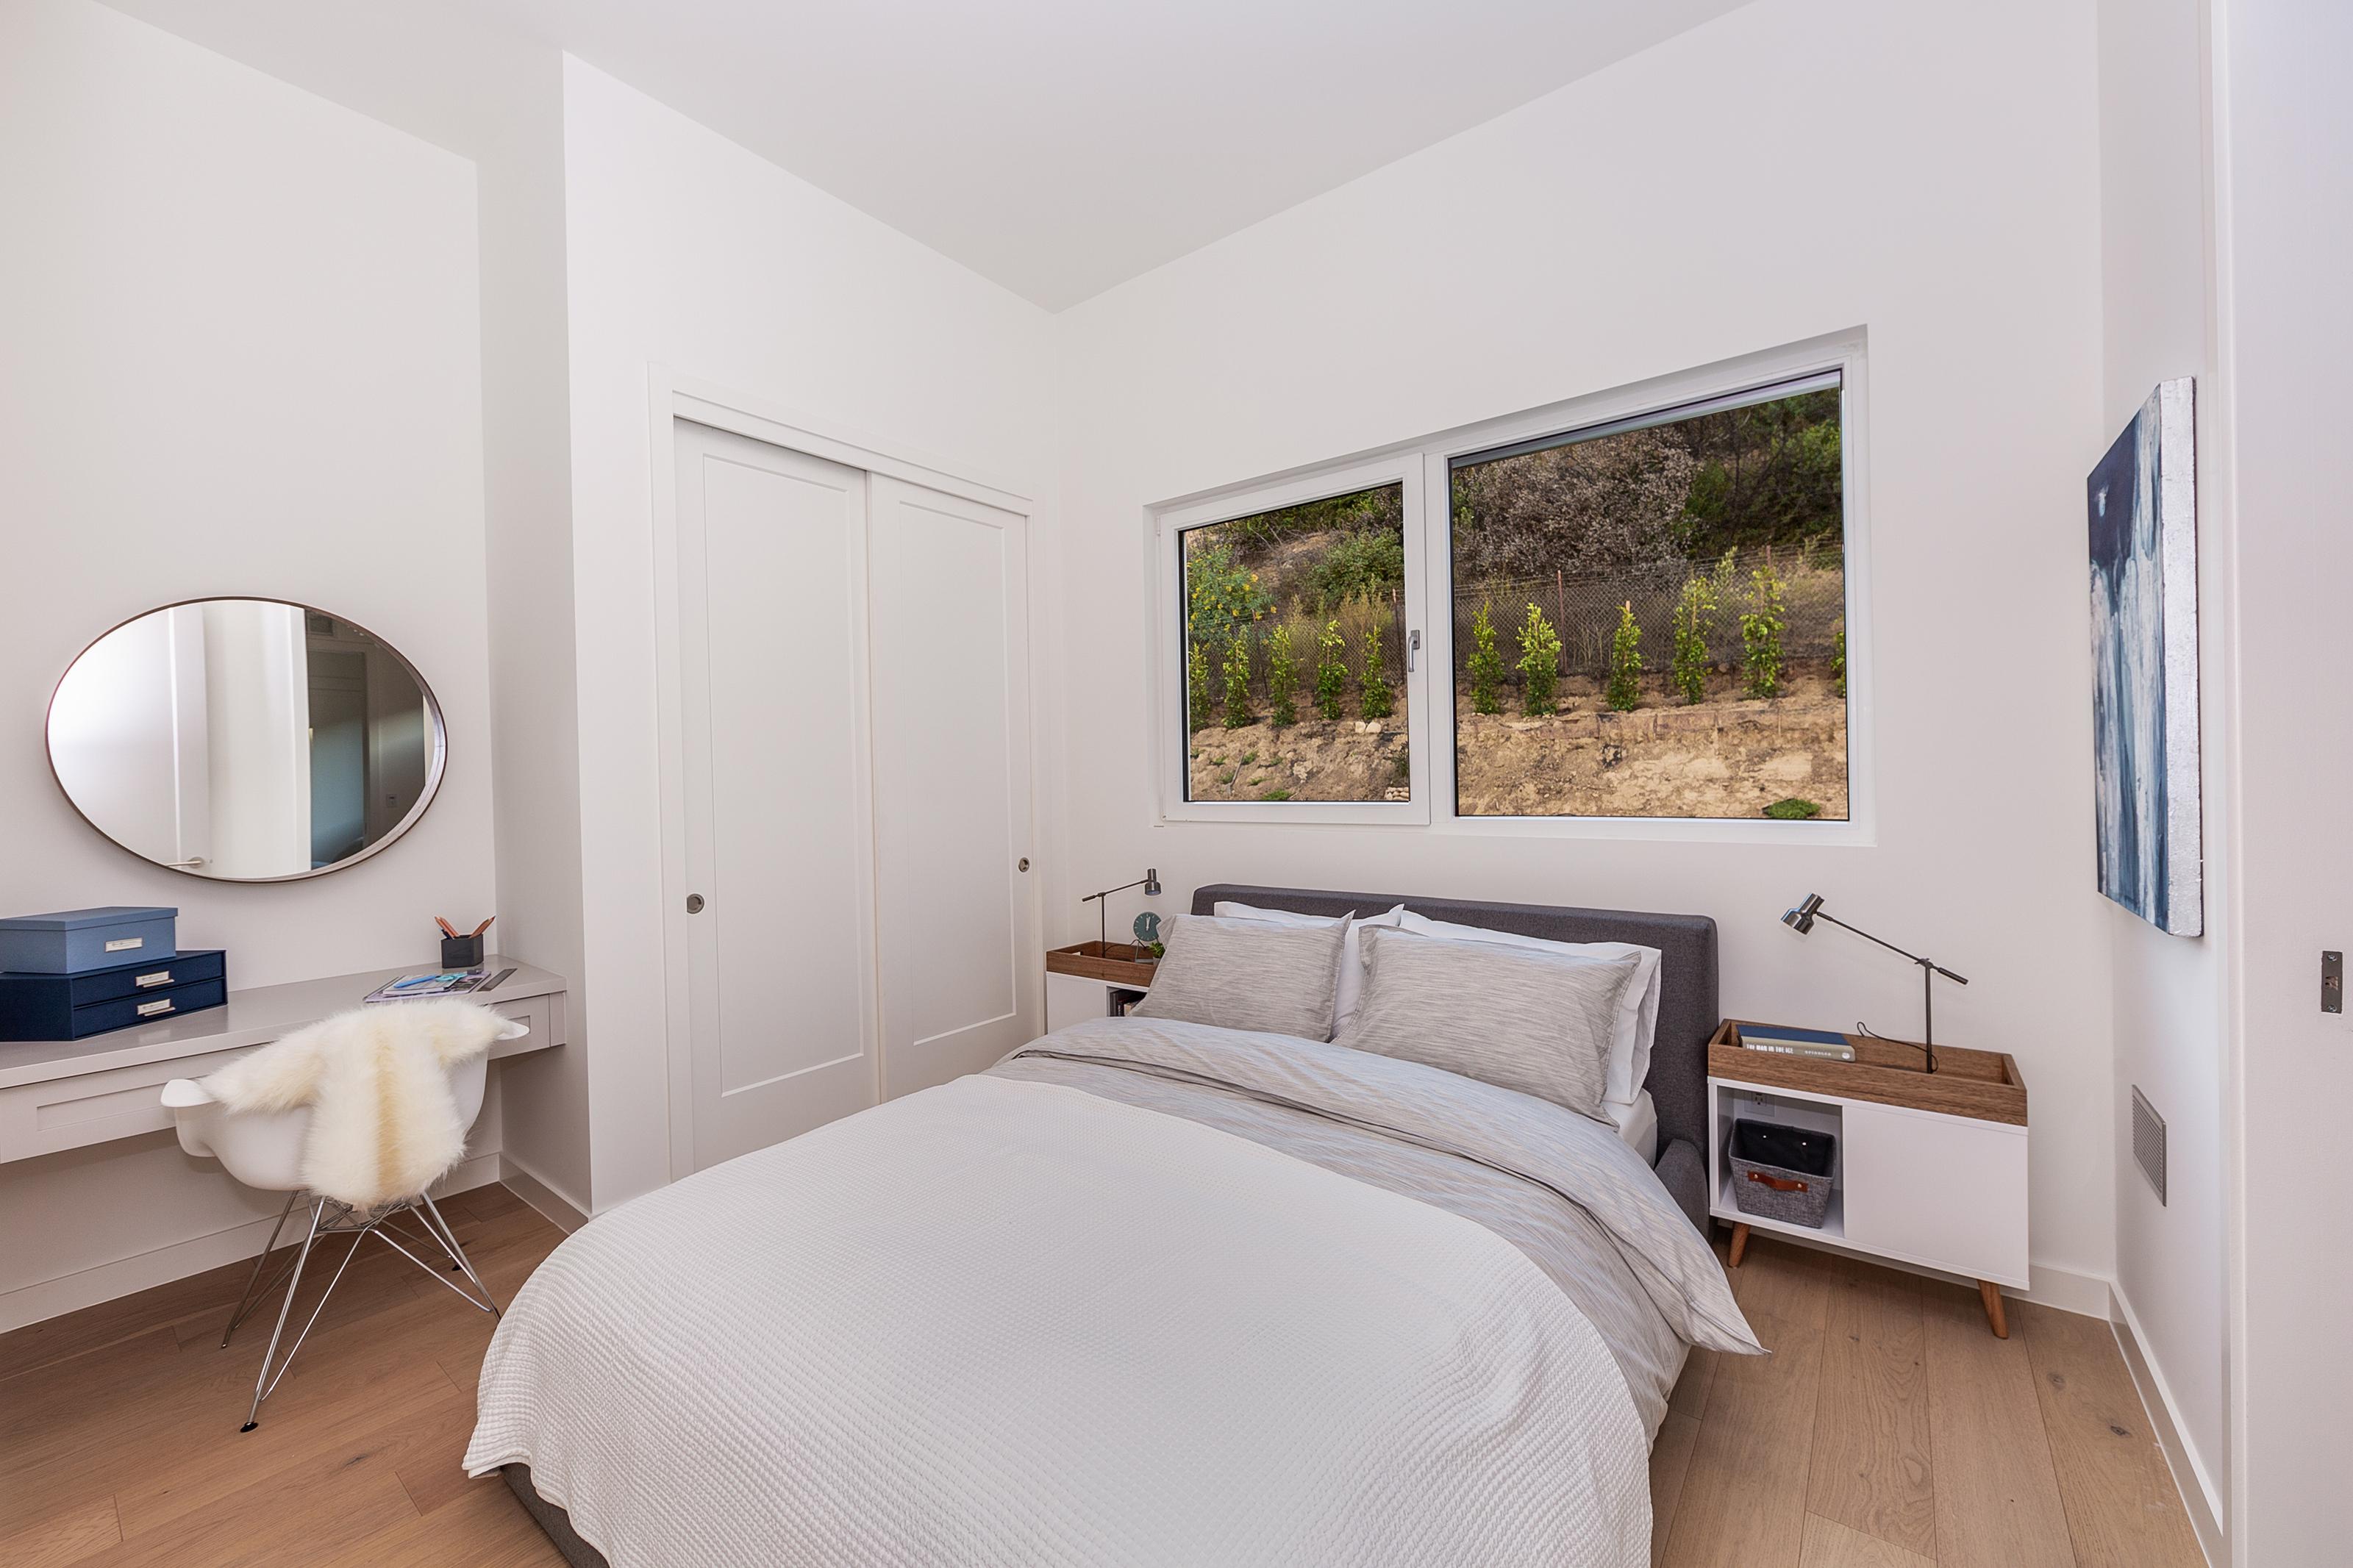 Dormitorio / Dvele Homes